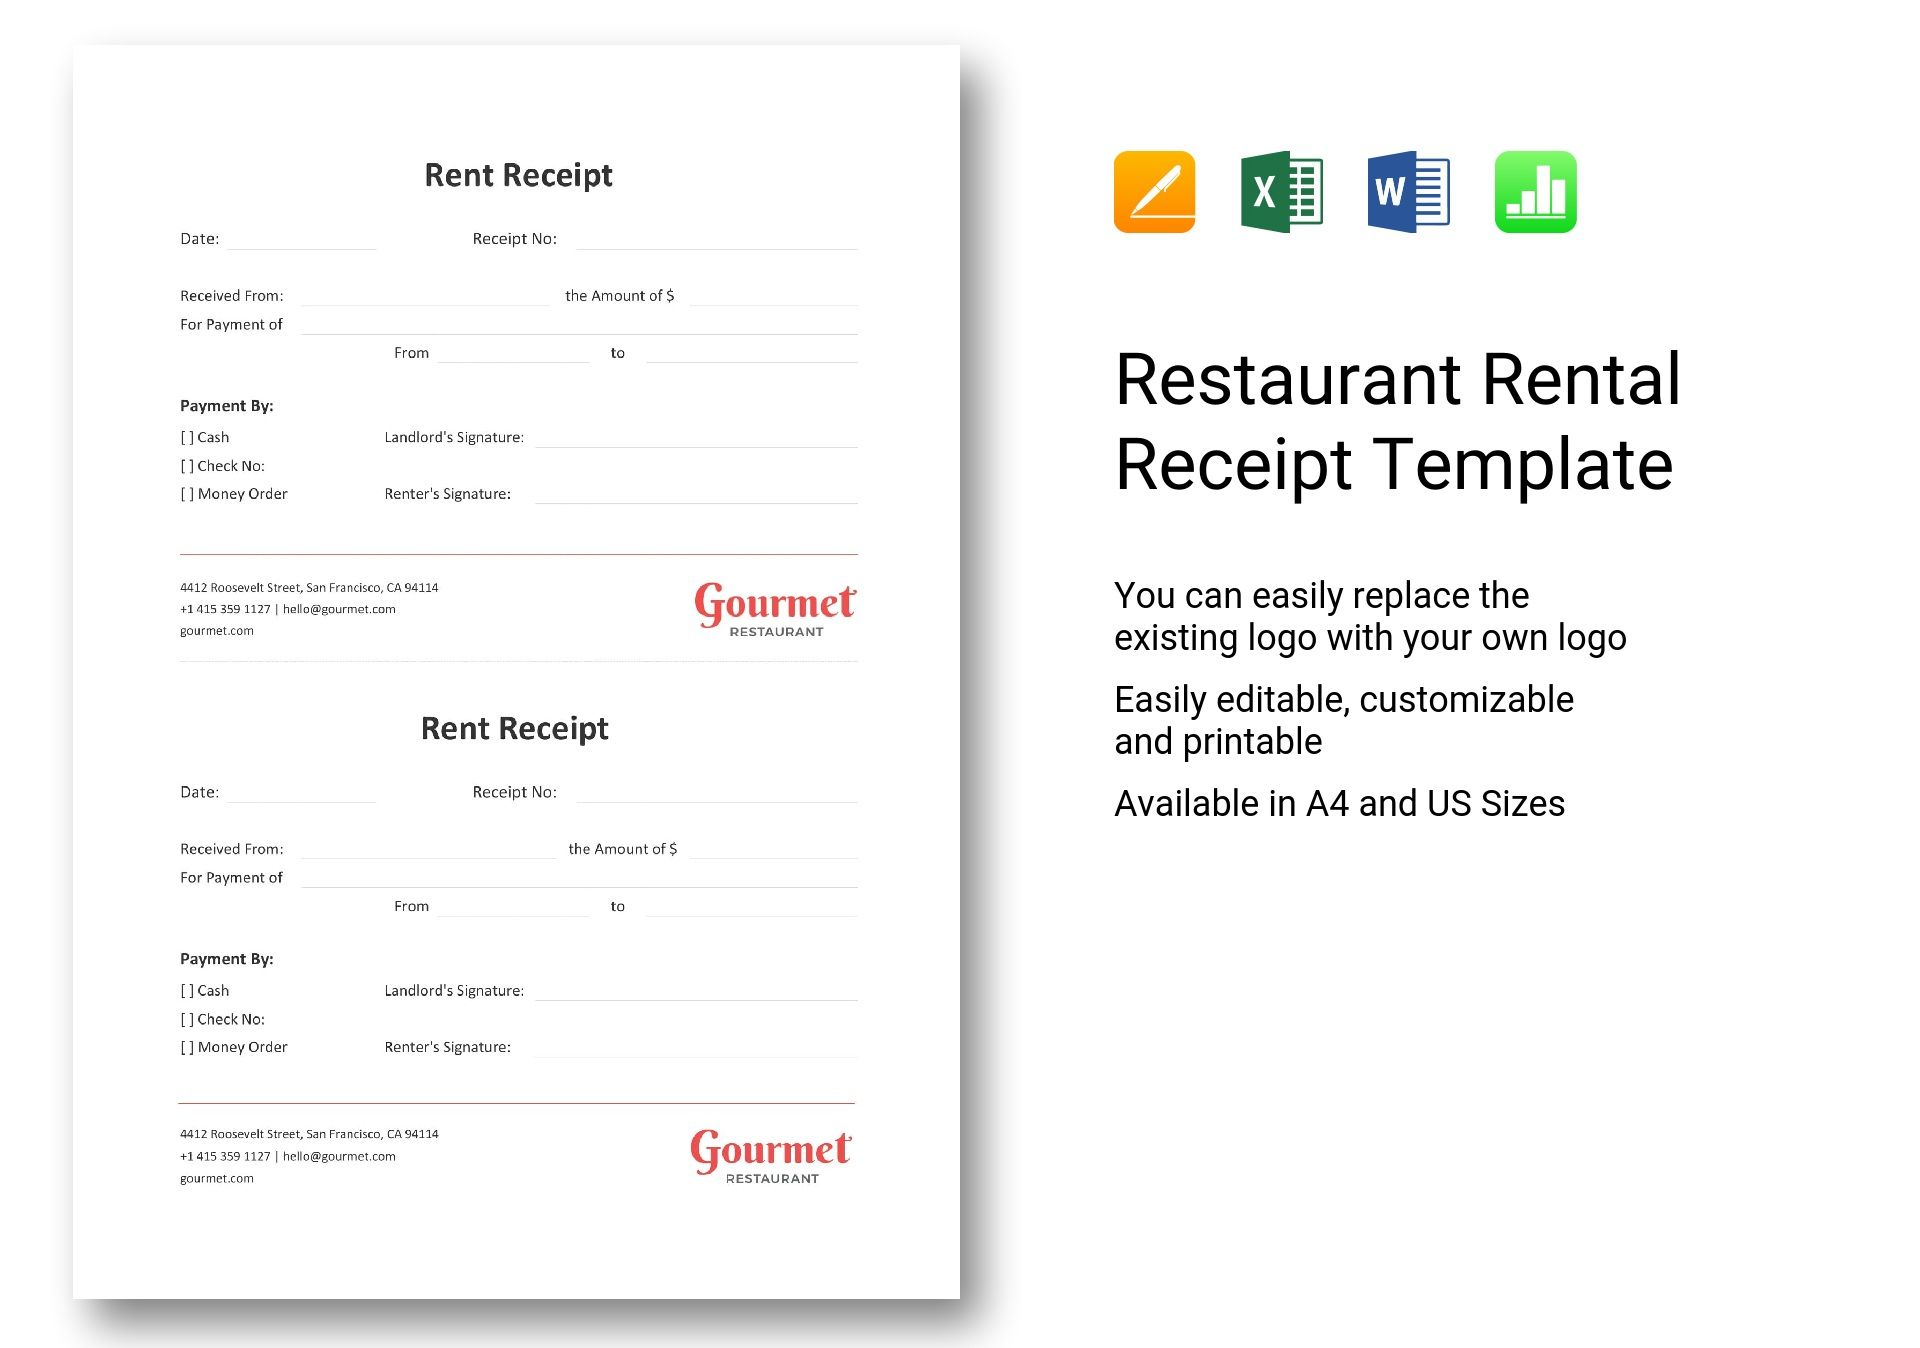 Restaurant Rental Receipt Template In Word Excel Apple